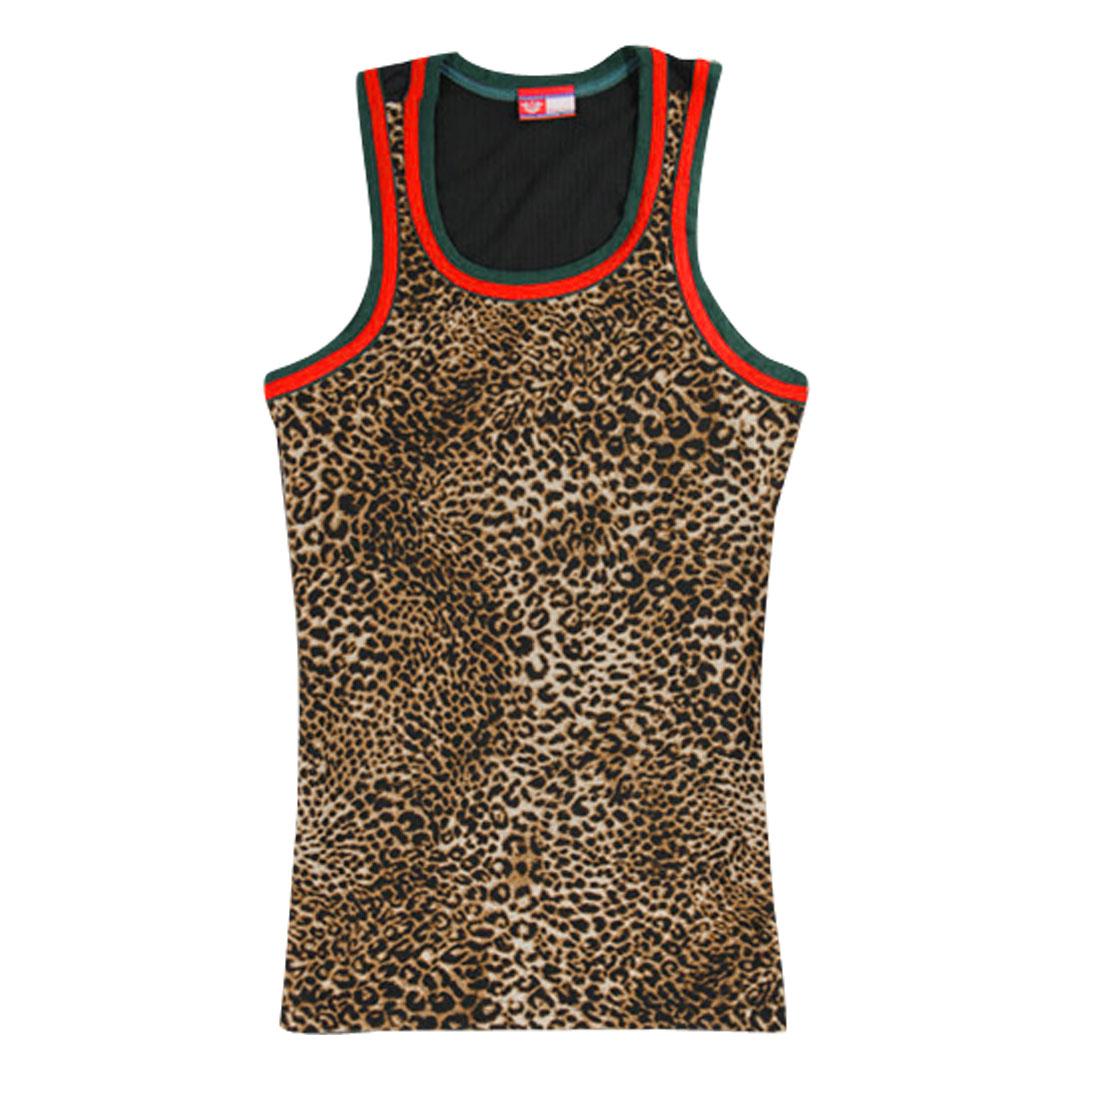 Men Leopard NEW Stylish U Neck Sleeveless Stretchy Tank Tops Black Brown M